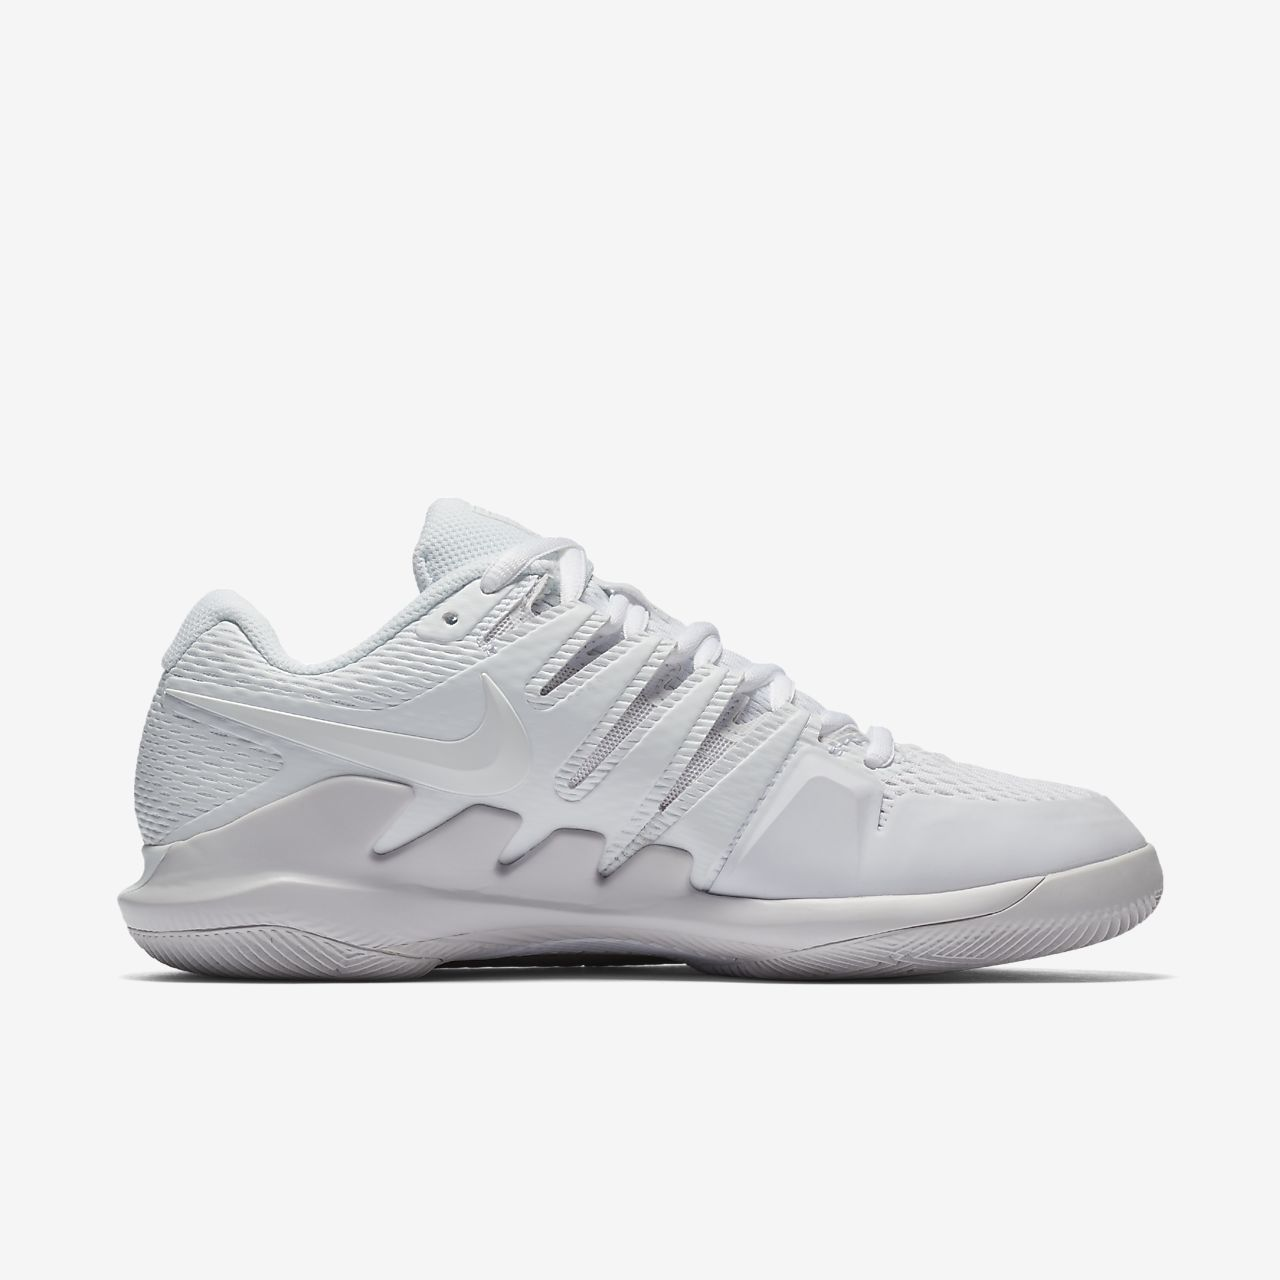 5bc2c8b95d2f3 NikeCourt Air Zoom Vapor X Women s Hard Court Tennis Shoe. Nike.com NL